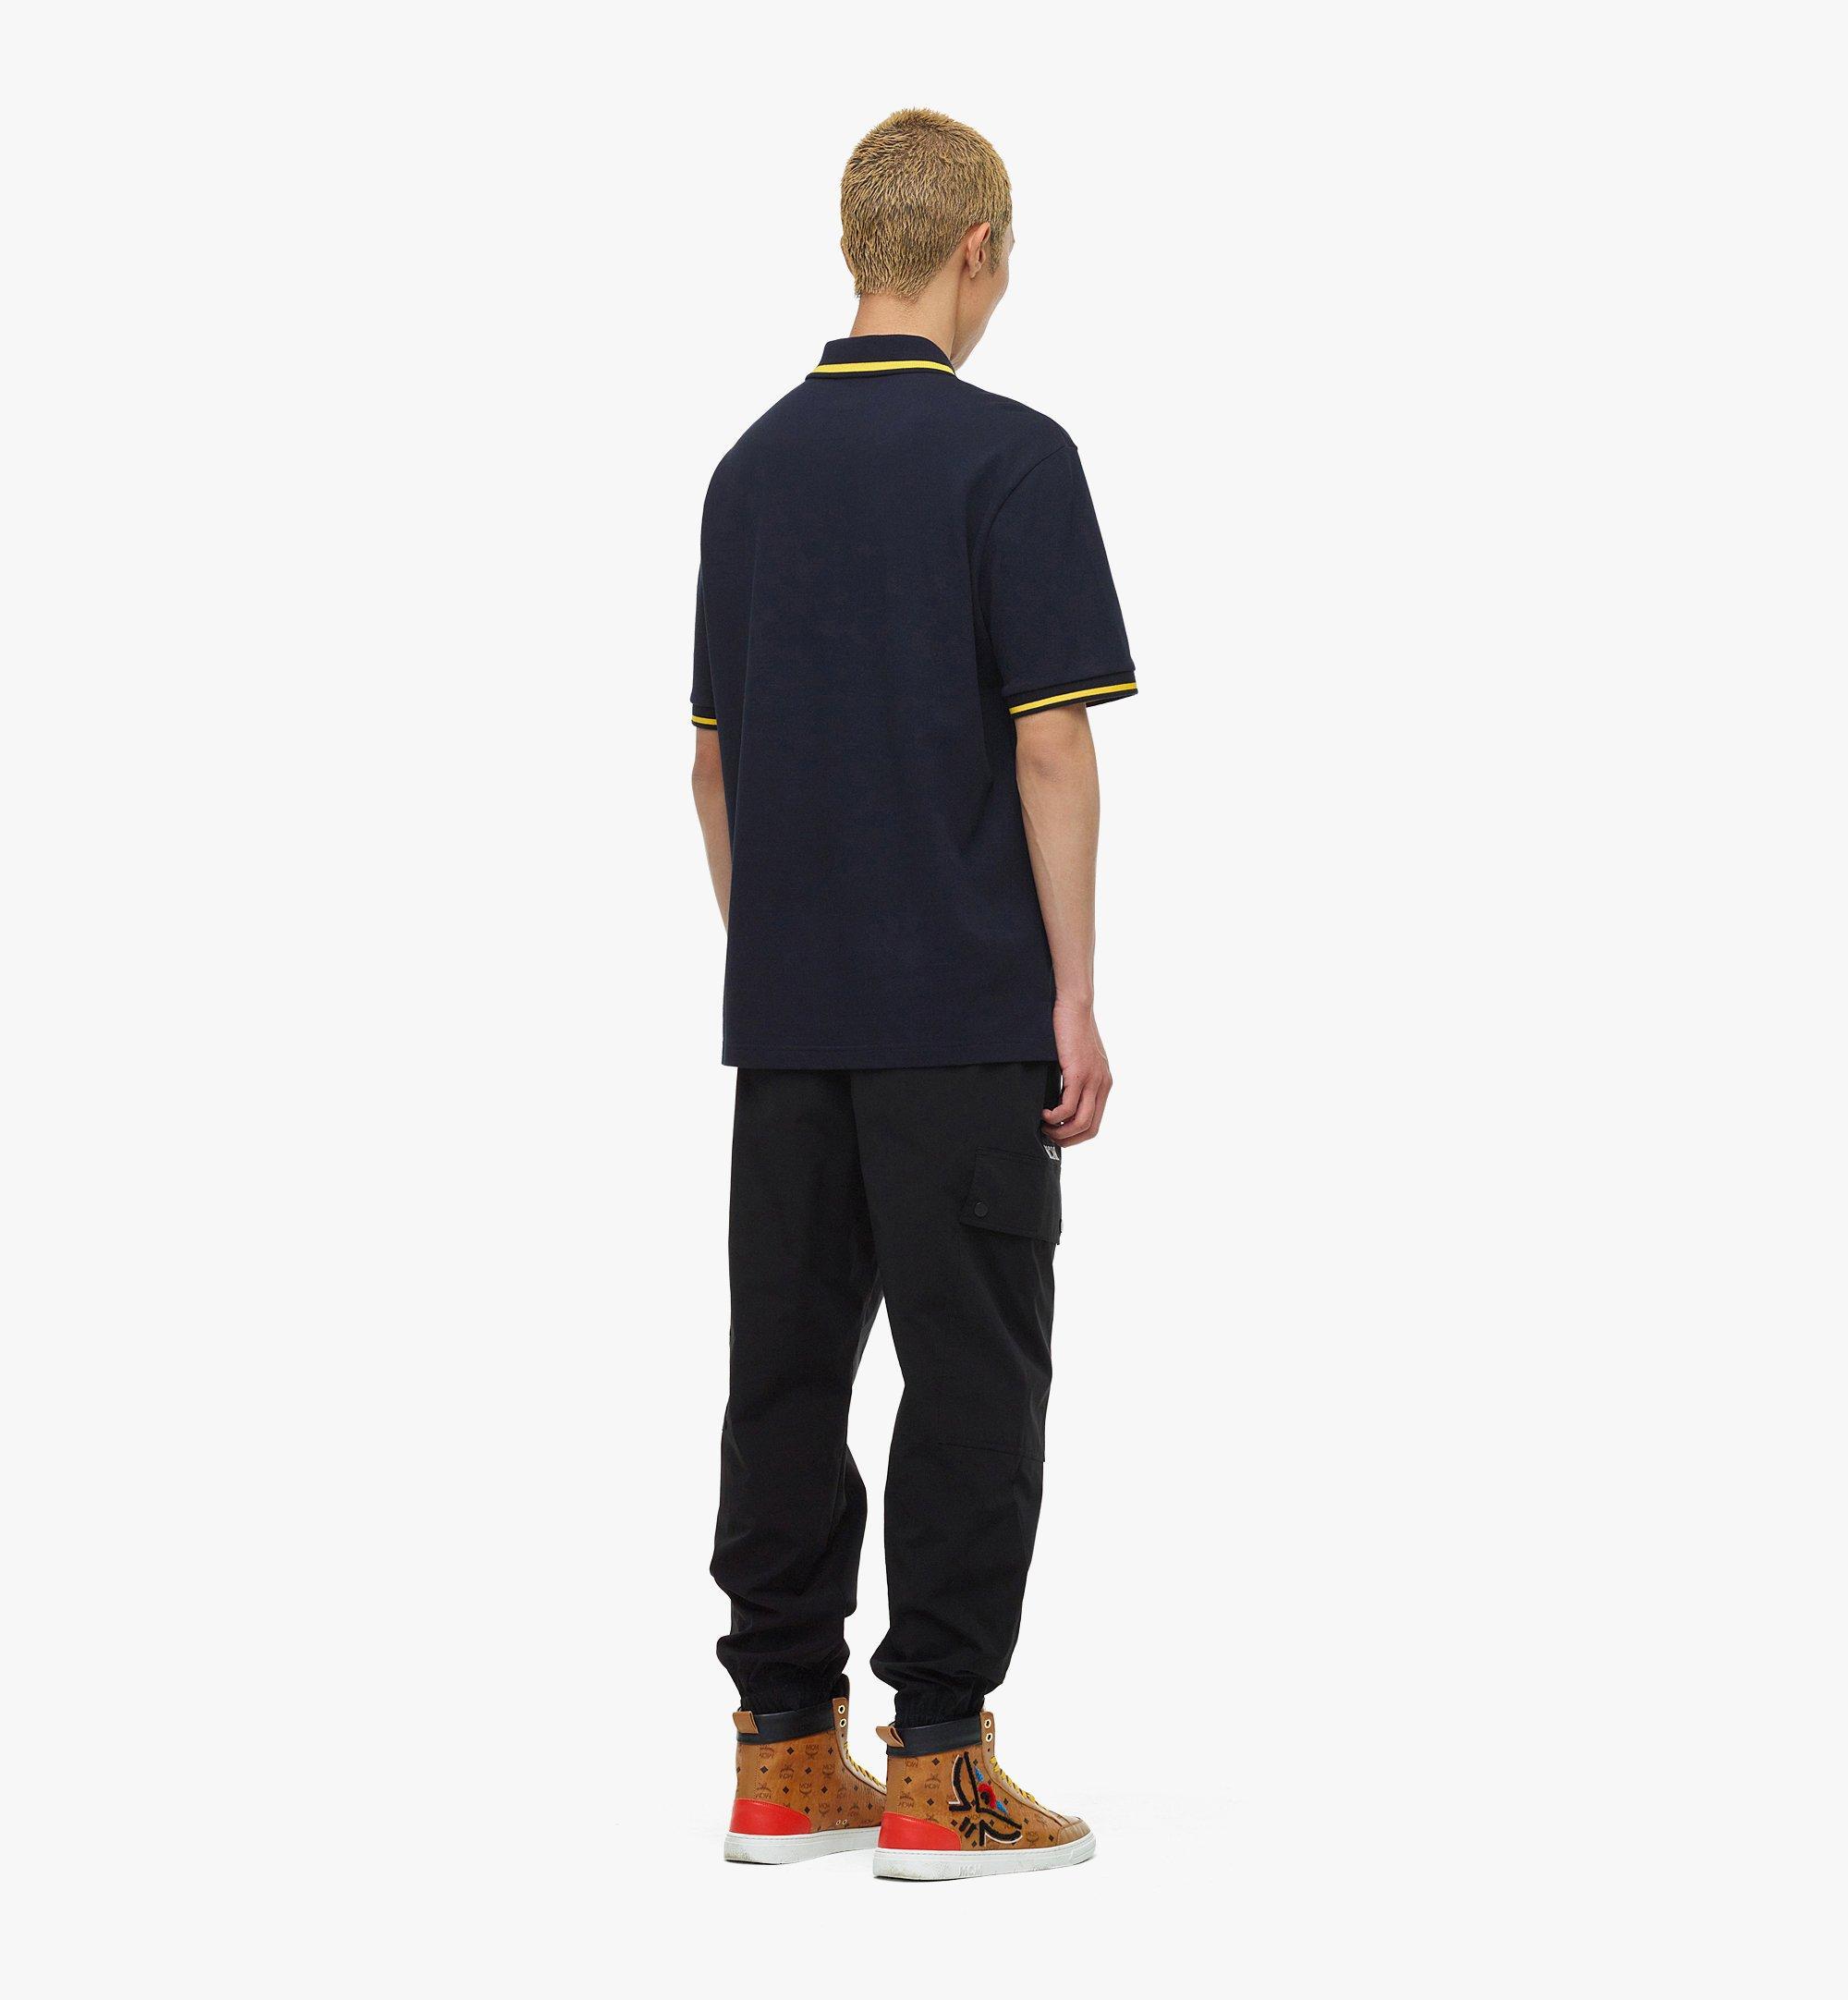 MCM MCM x SAMBYPEN Men's Polo Shirt Blue MHTBASP01VY00L Alternate View 2